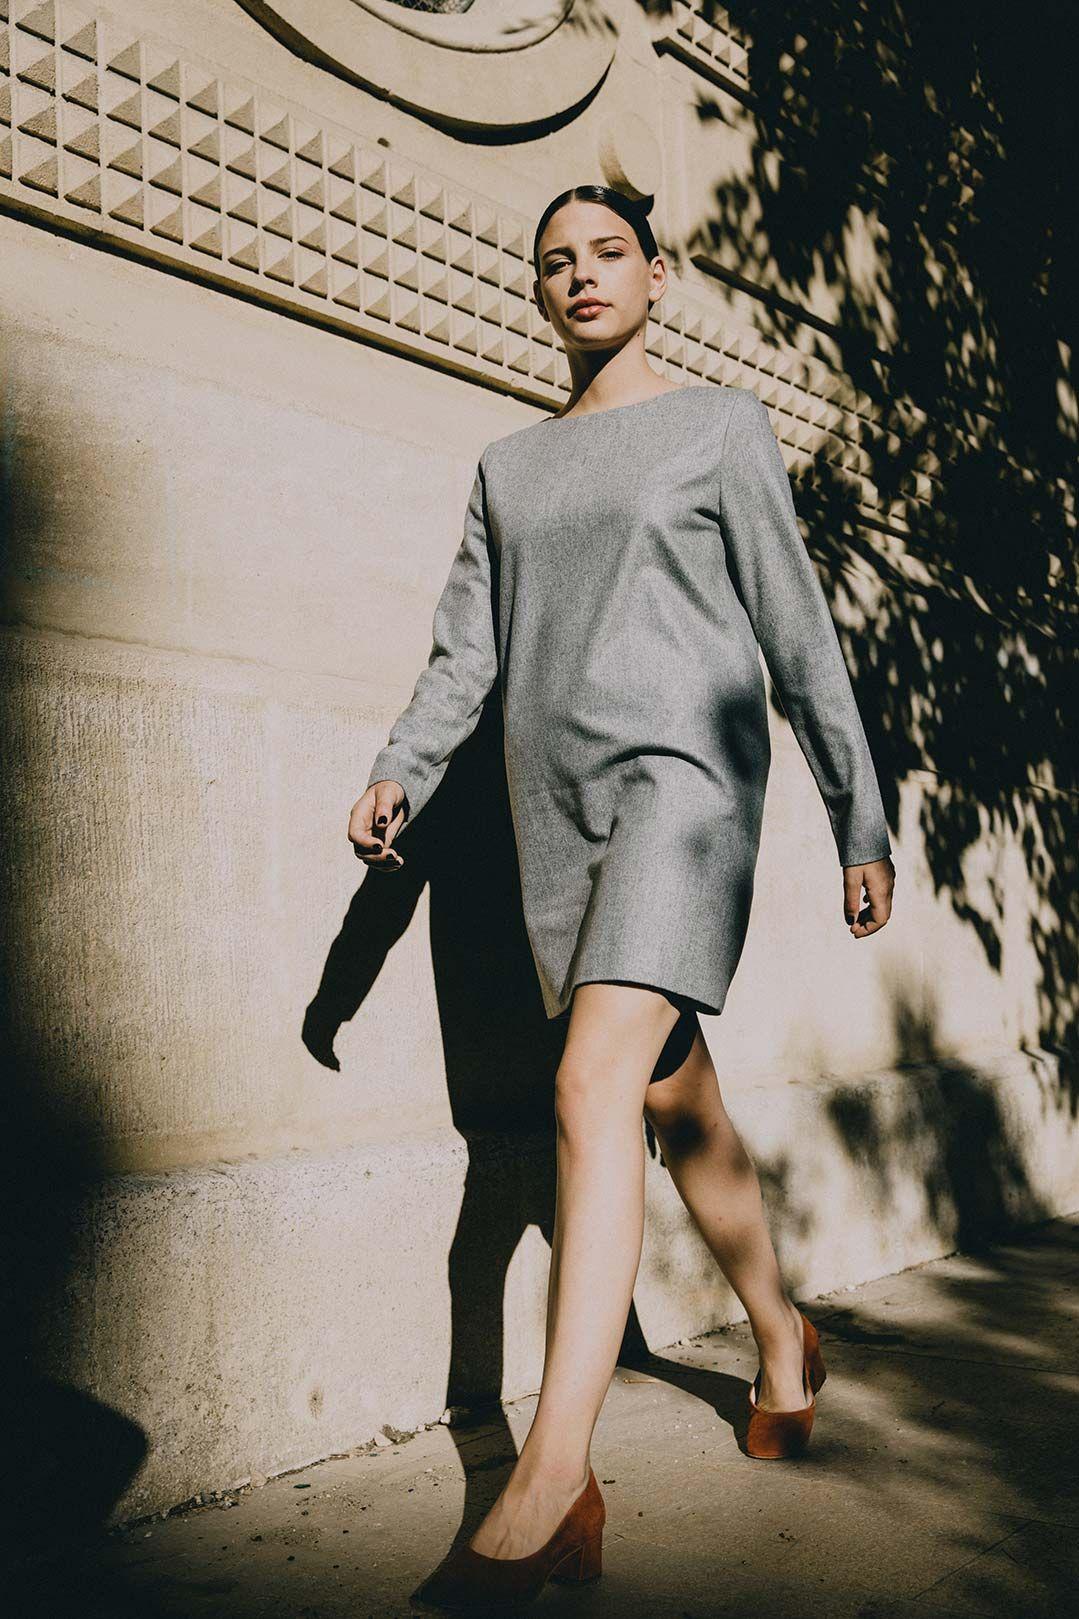 f0d4dfb7163e Robe droite grise en laine flanelle Carolyne- Made in France .Basique ATODE.  .Coupe droite. .Laine flanelle grise chinée et entièrement doublée